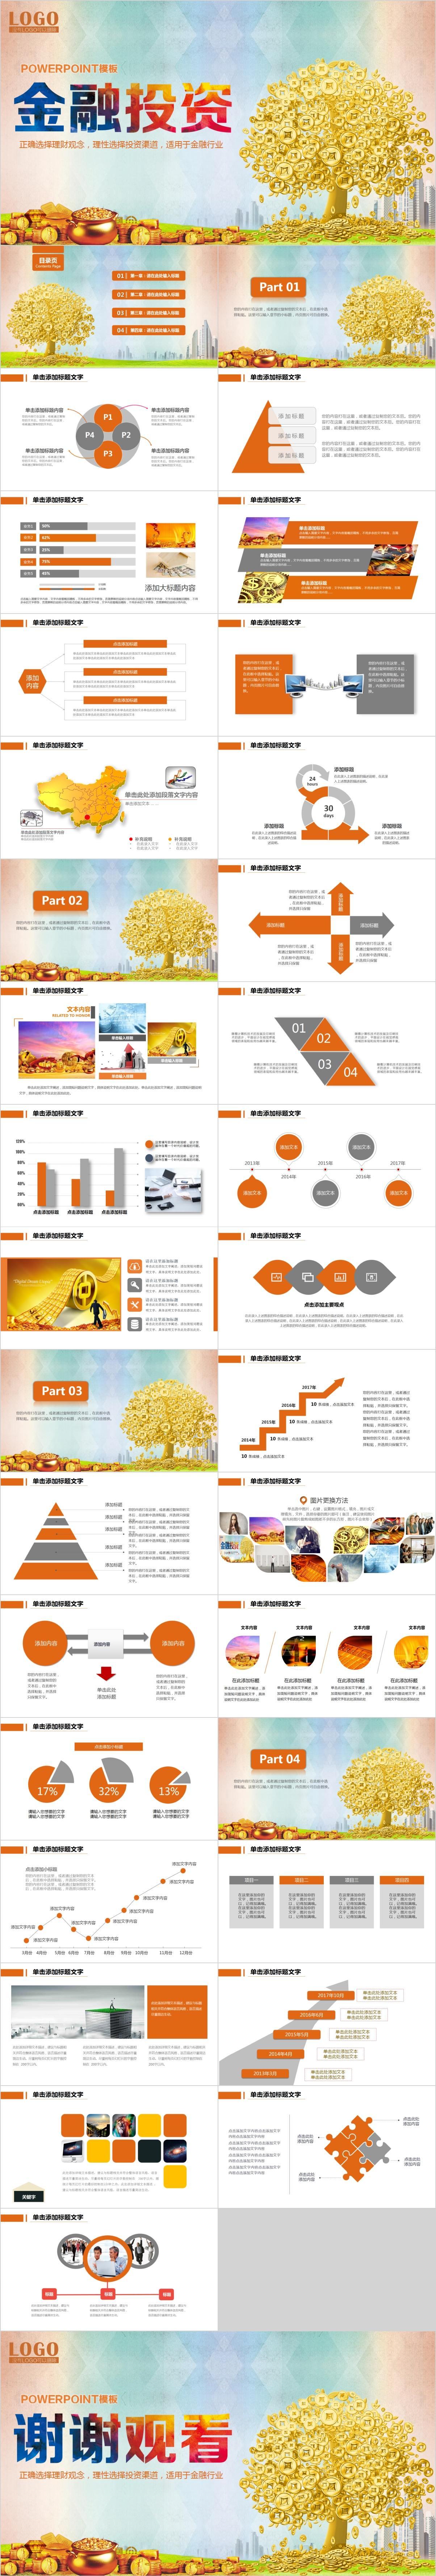 BC0149 金融投资PPT模板